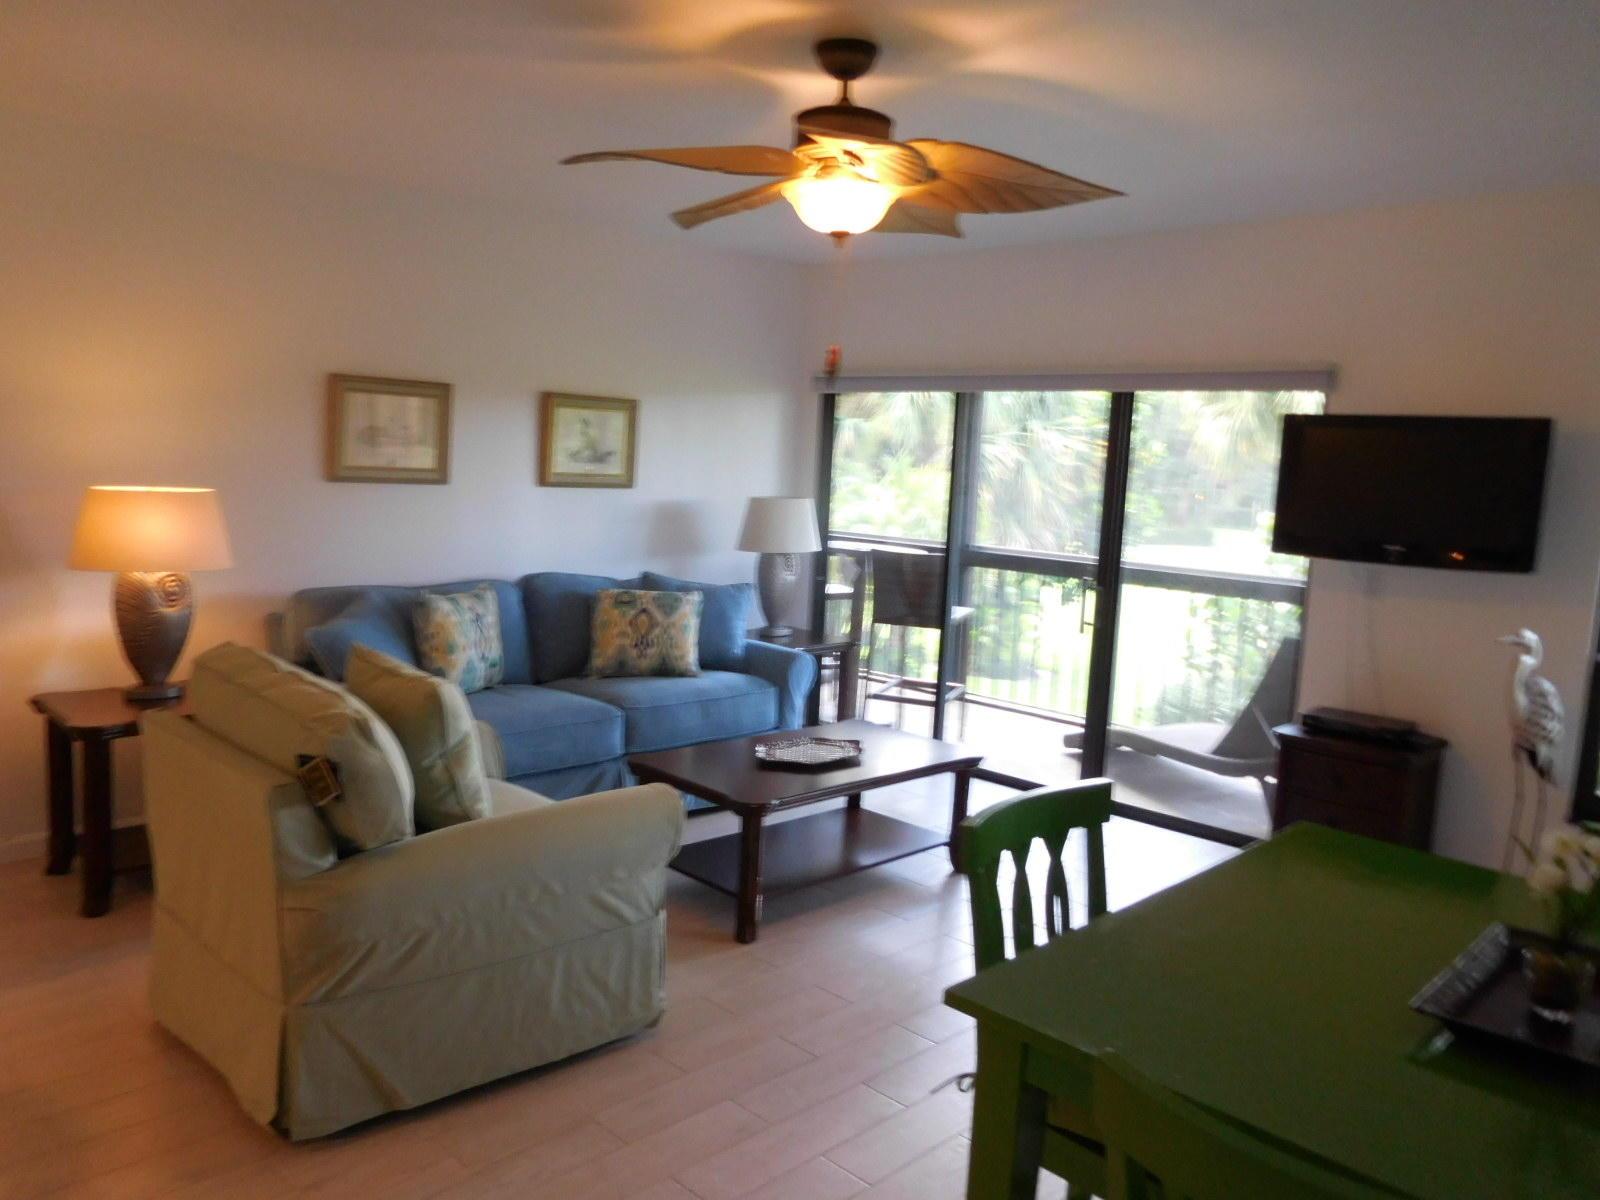 Wellington, Florida 33414, 1 Bedroom Bedrooms, ,1 BathroomBathrooms,Rental,For Rent,Polo Club Road, 342,RX-10639183